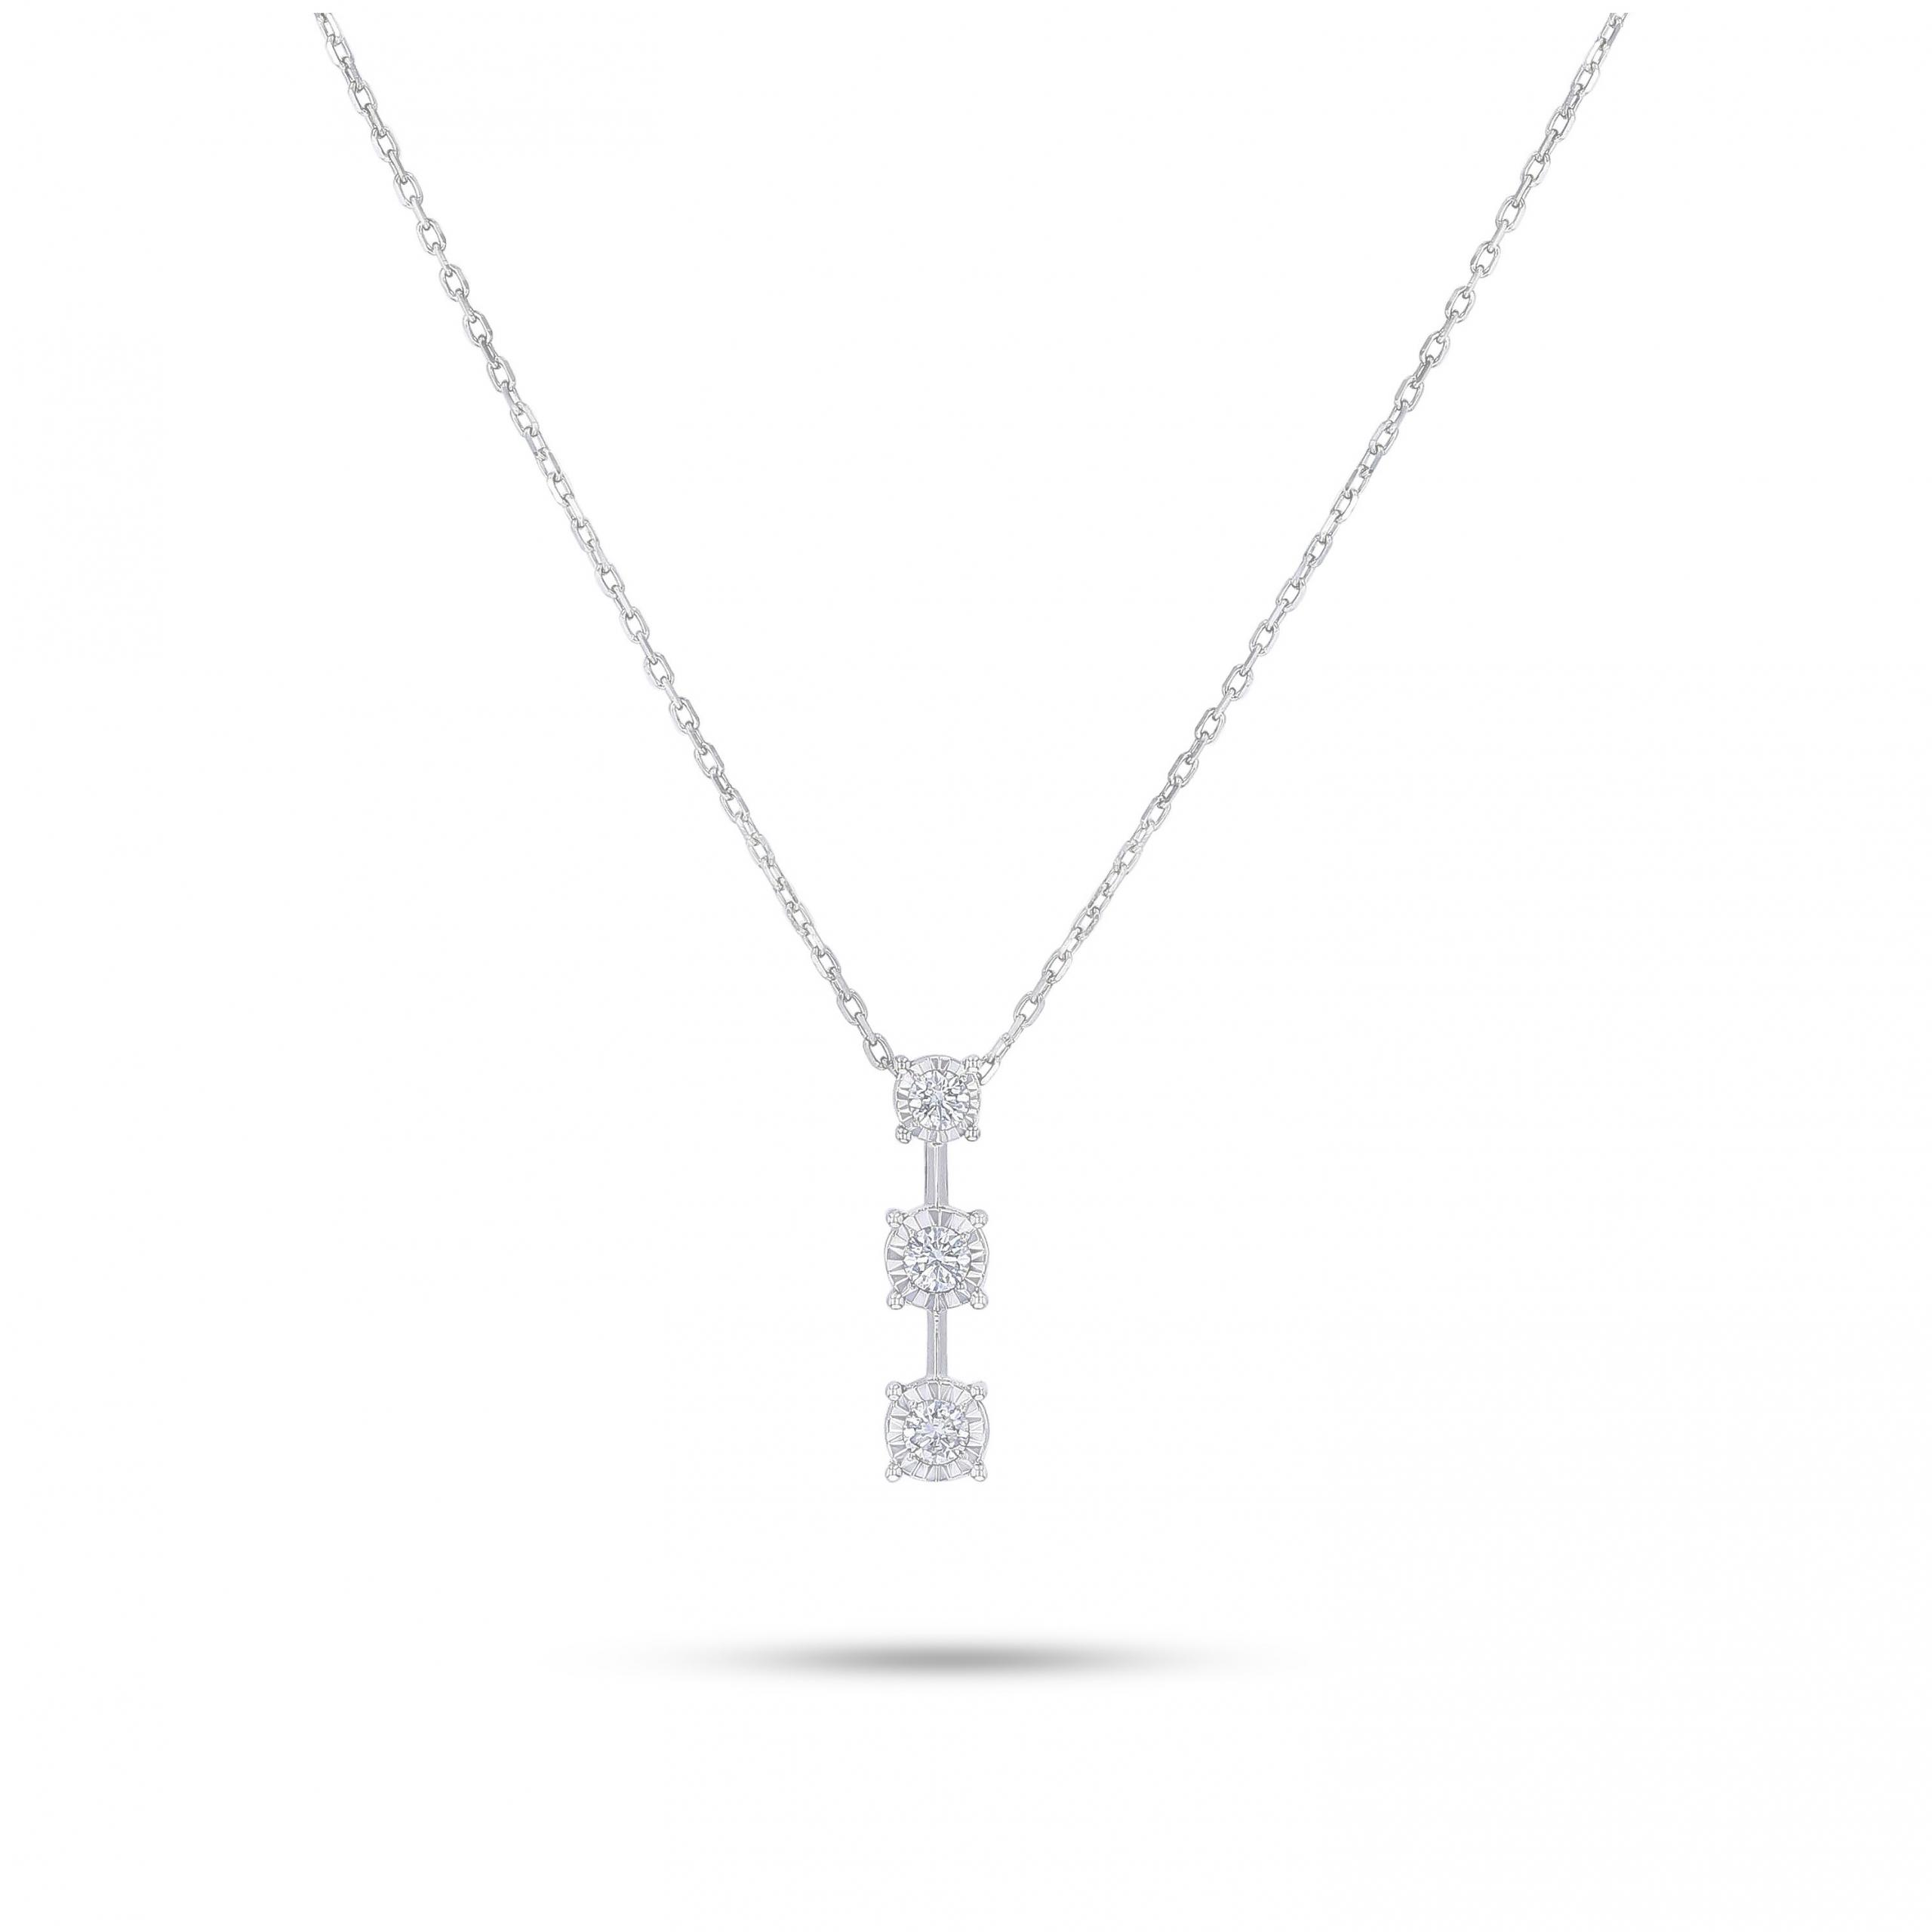 Triology Pendant Chain